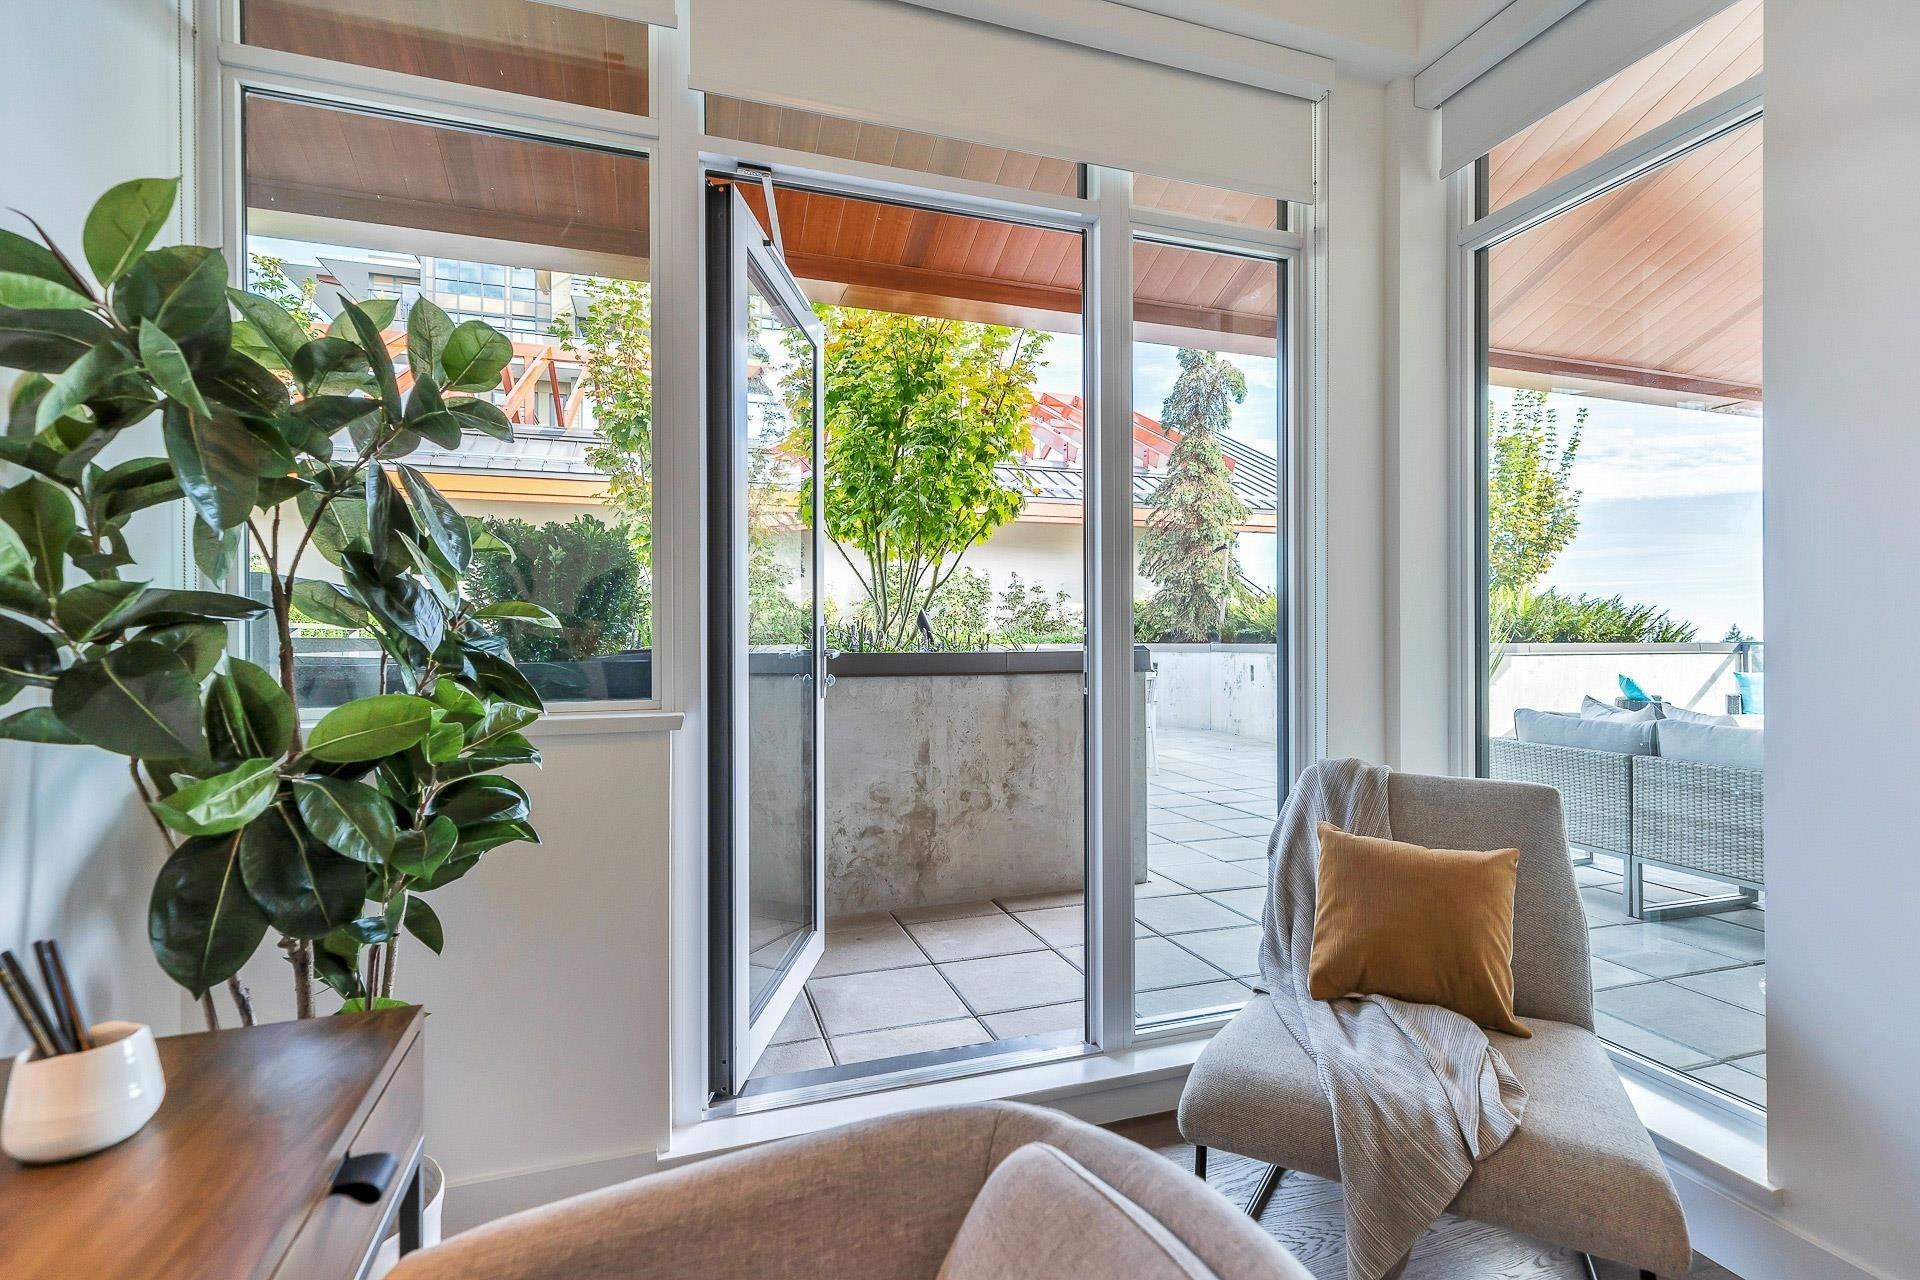 702 2780 VALLEY CENTRE AVENUE - Lynn Valley Apartment/Condo for sale, 3 Bedrooms (R2622279) - #19